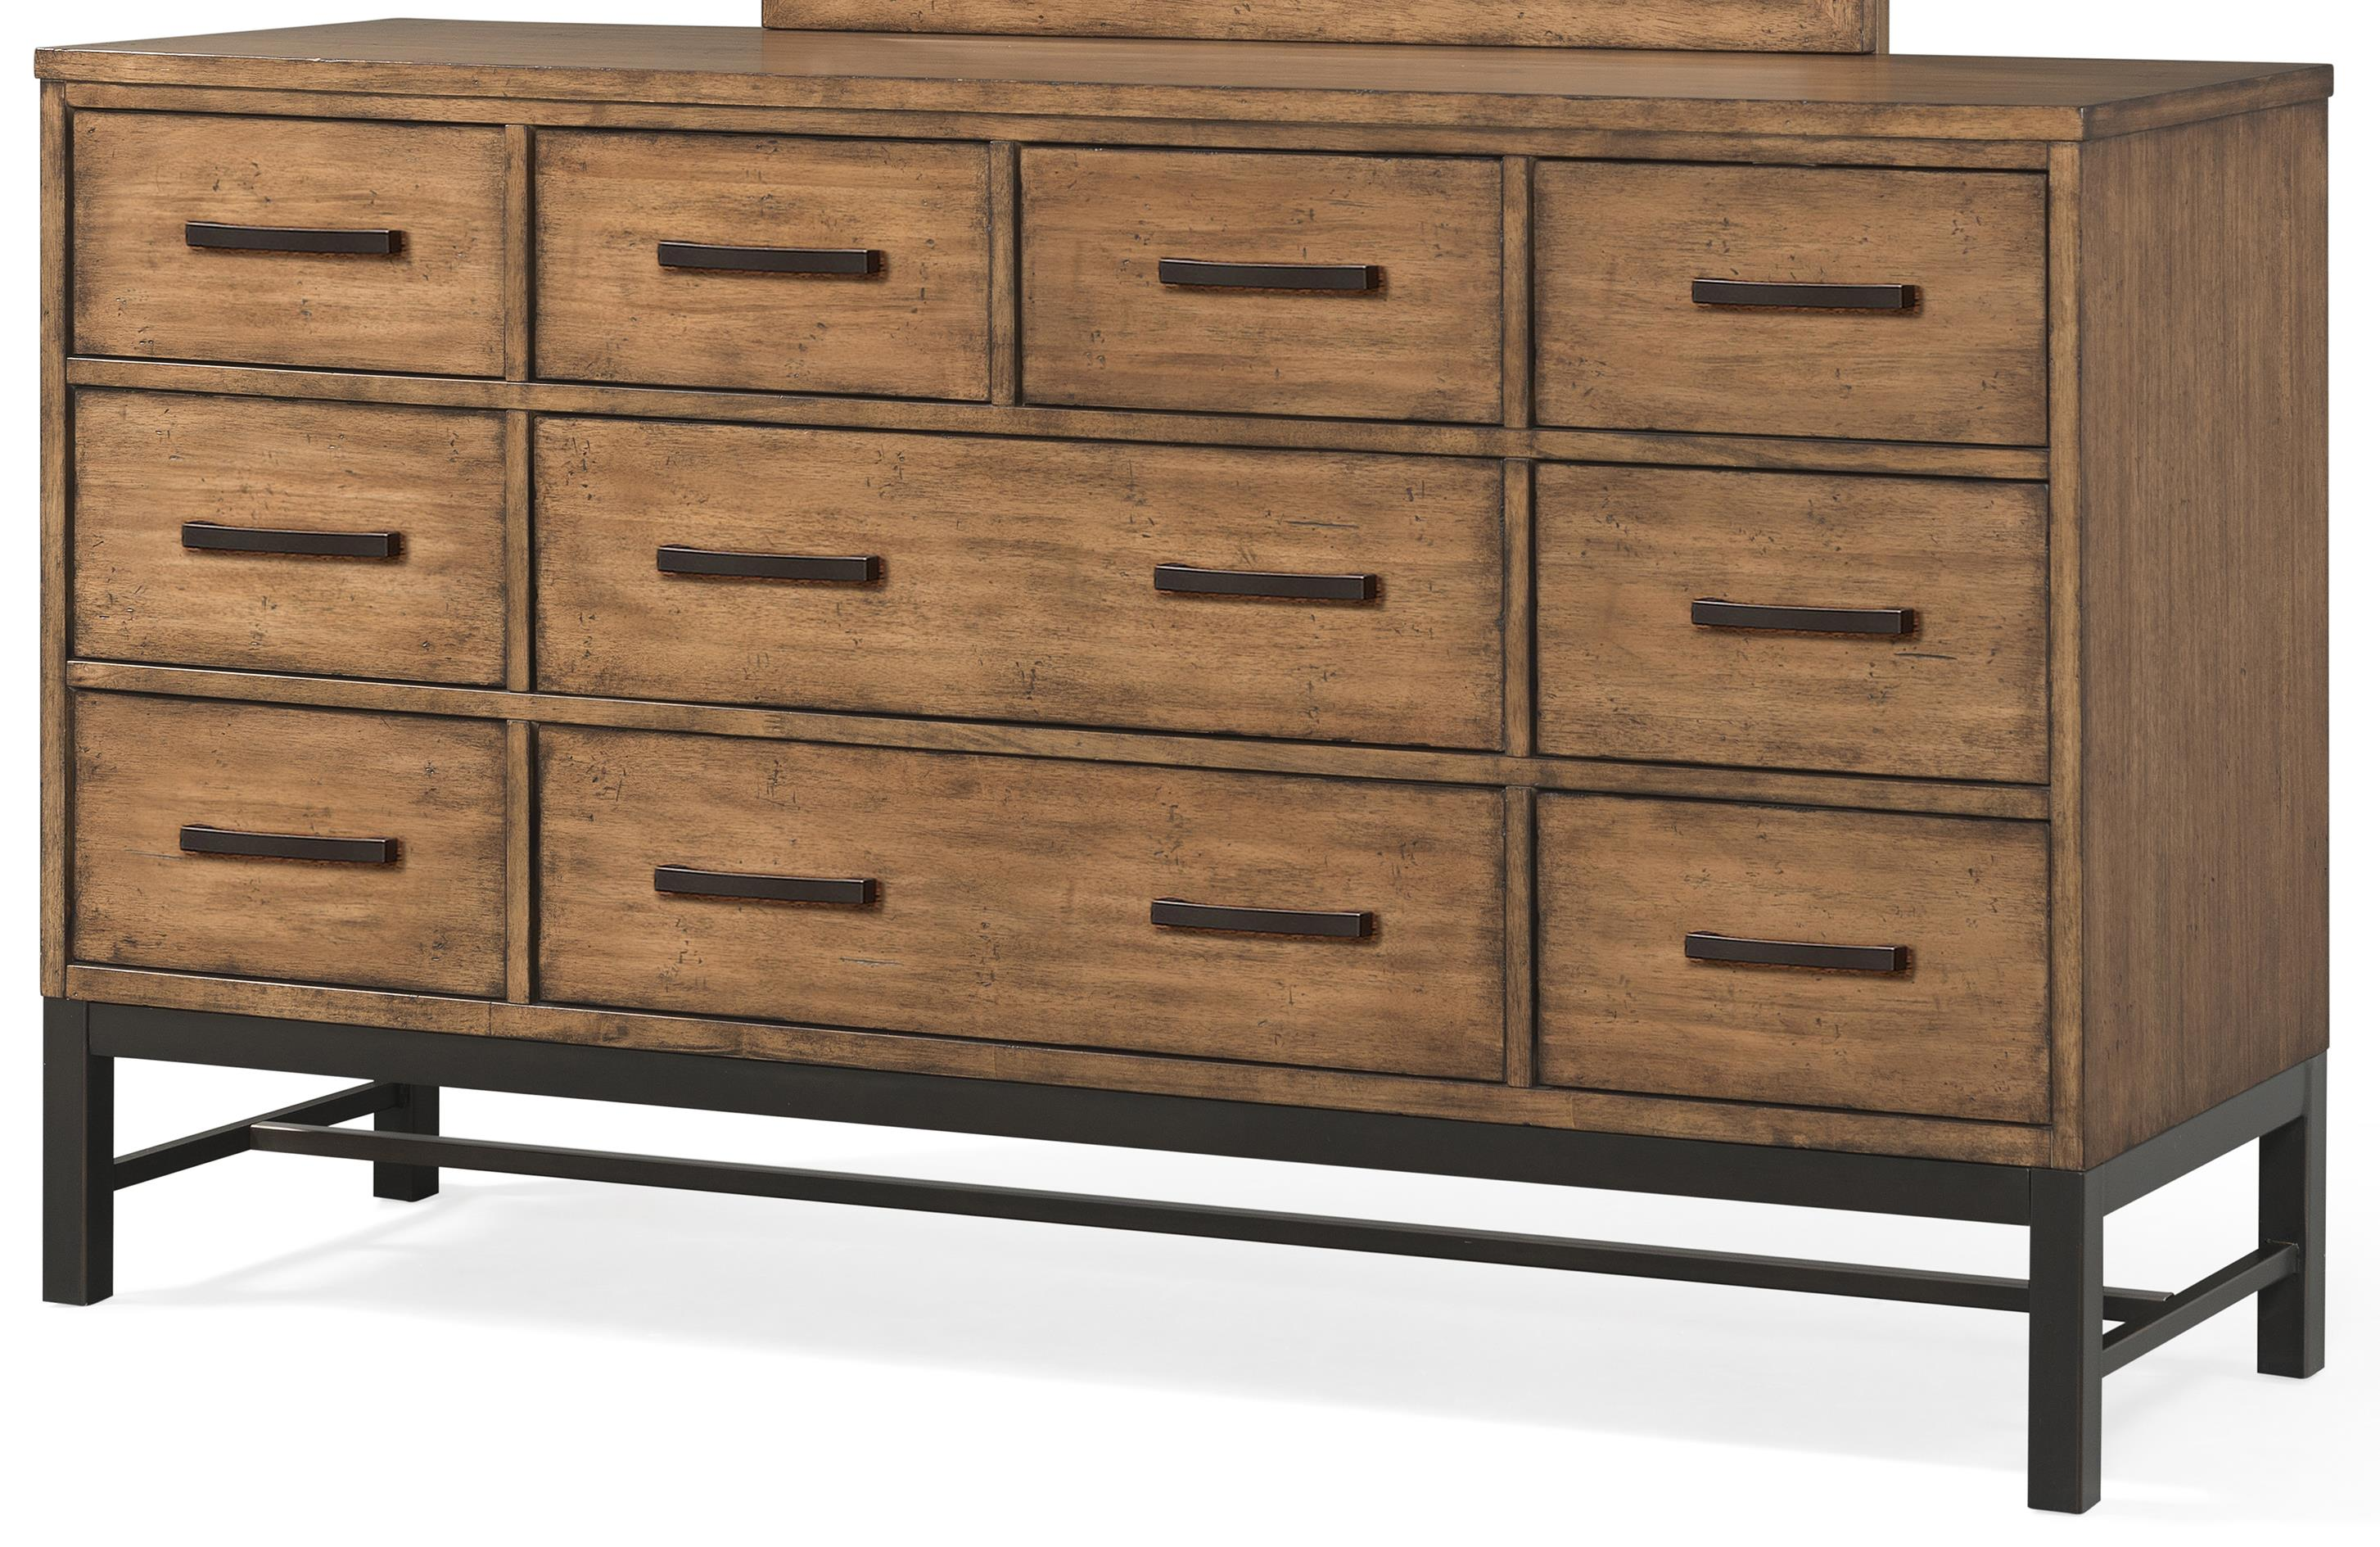 Morris Home Furnishings Tribecca Tribecca Dresser - Item Number: 710-650